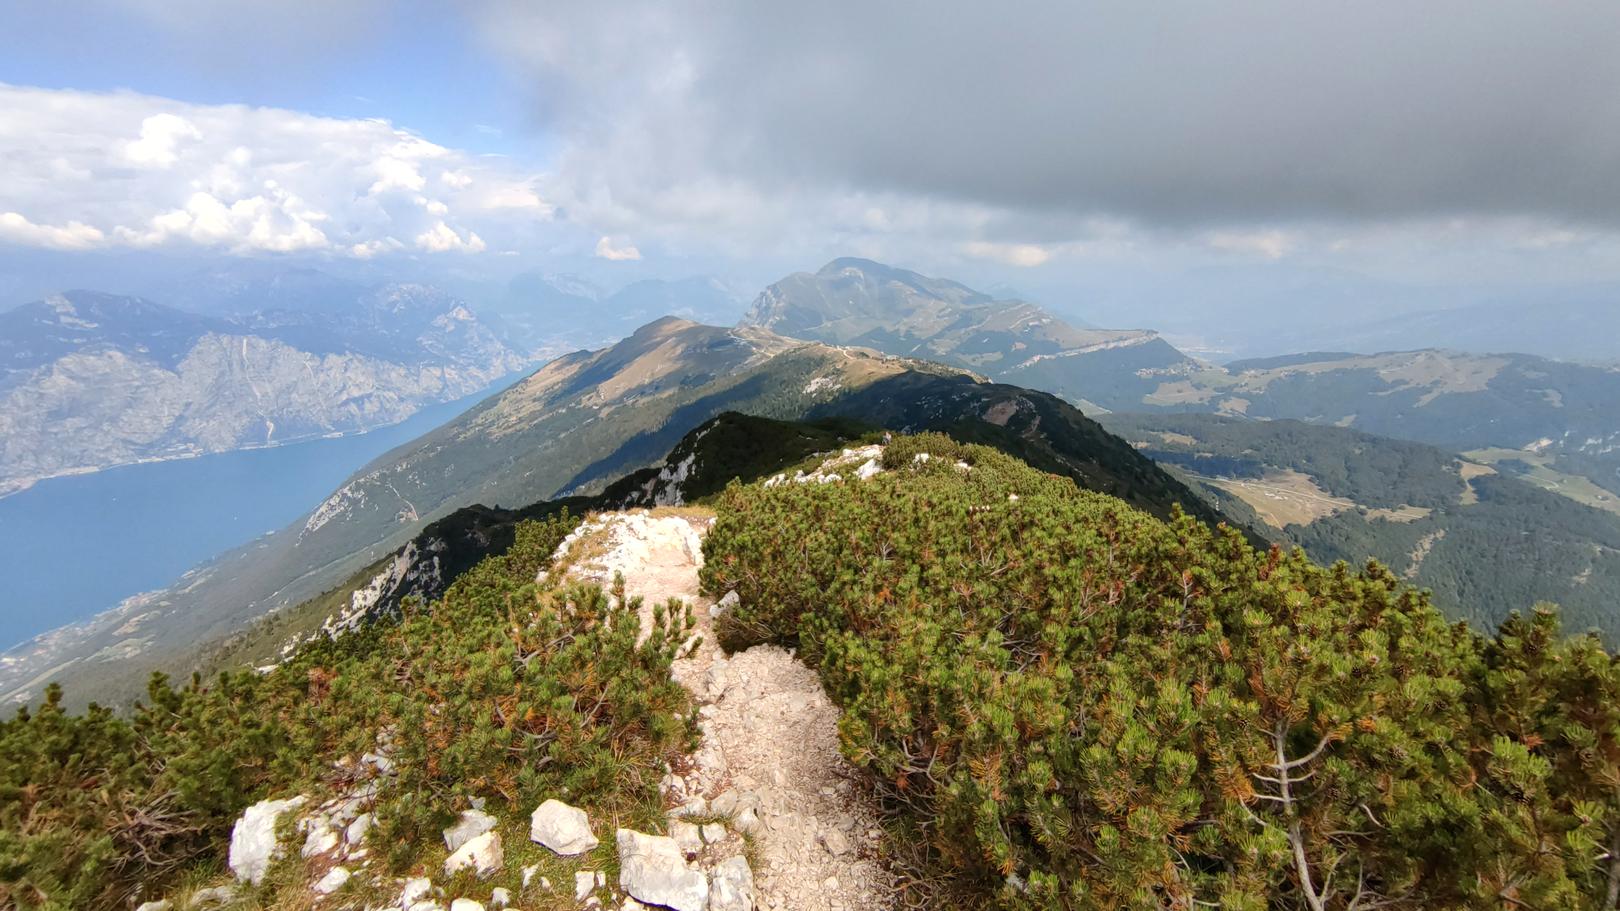 Wanderung entlang des Monte Baldo Bergrücken